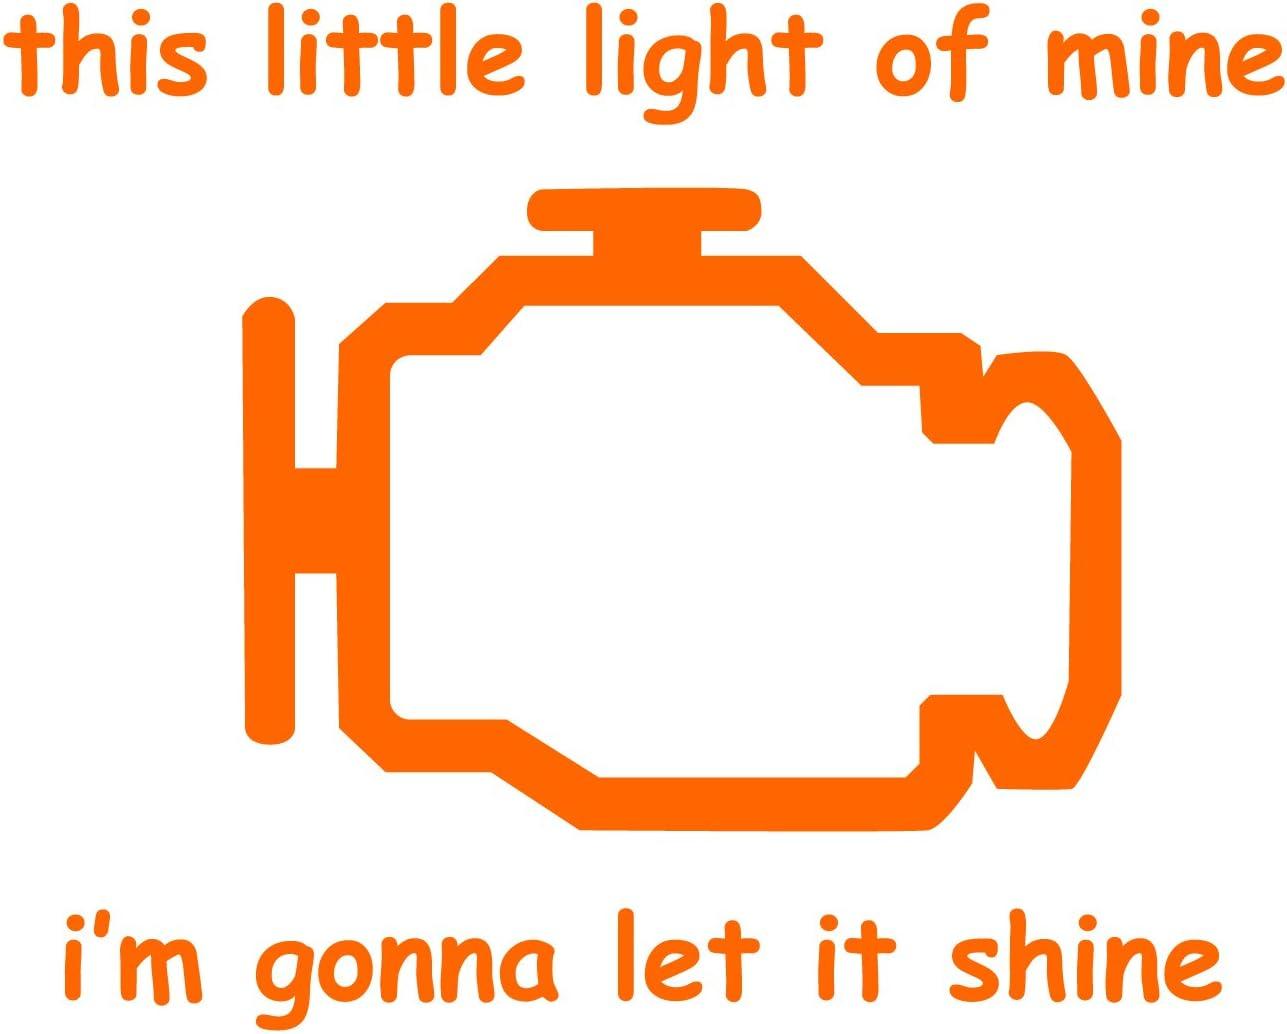 "Check Engine Light - Orange 5"" Vinyl Decal for Car, Macbook, or Other Laptop"